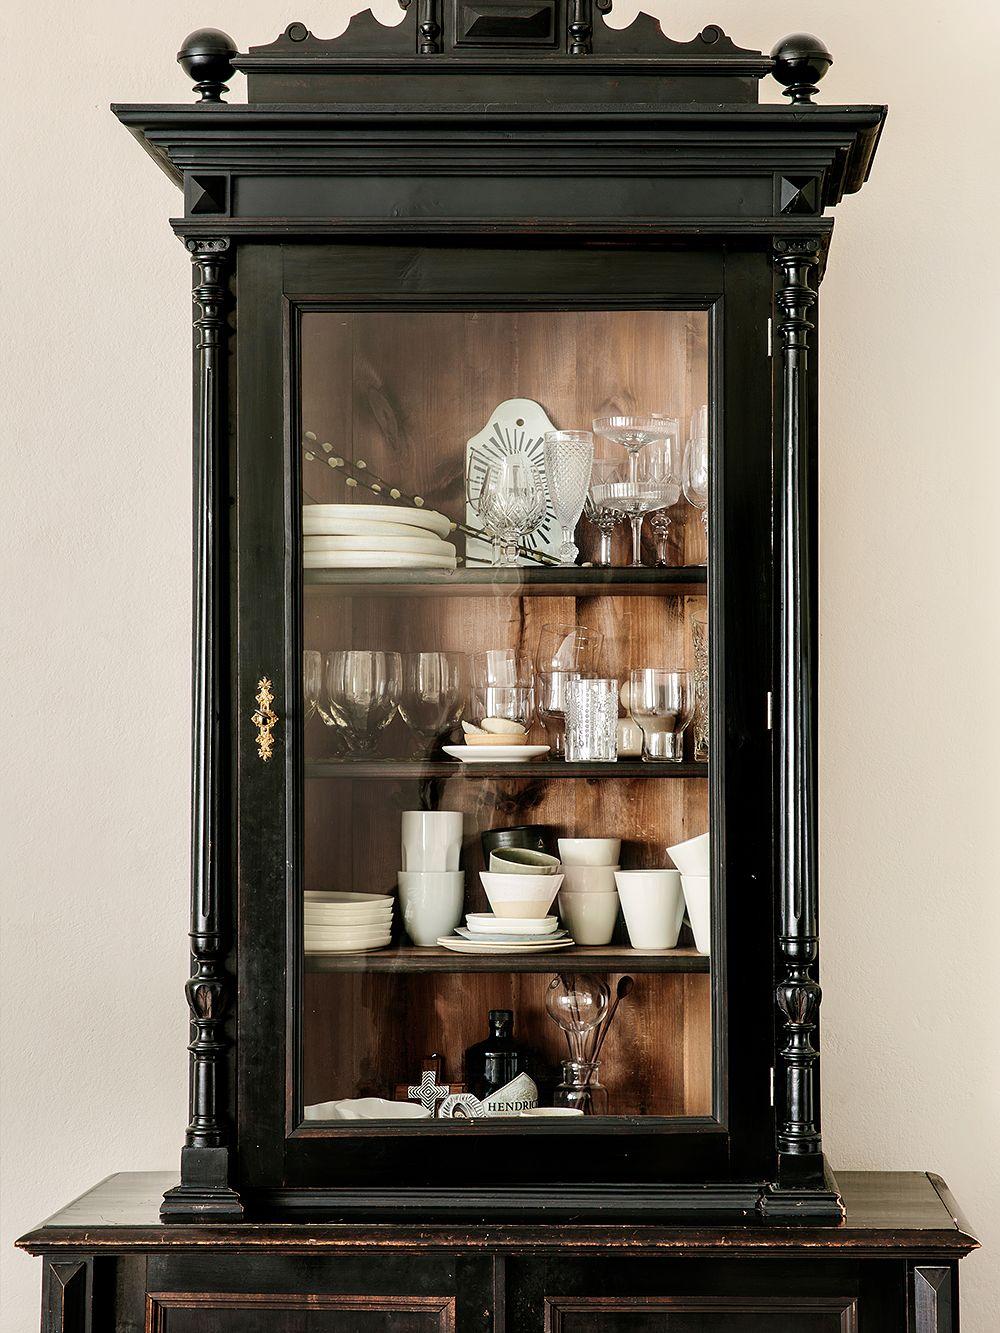 Peeta Peltola's antique cabinet